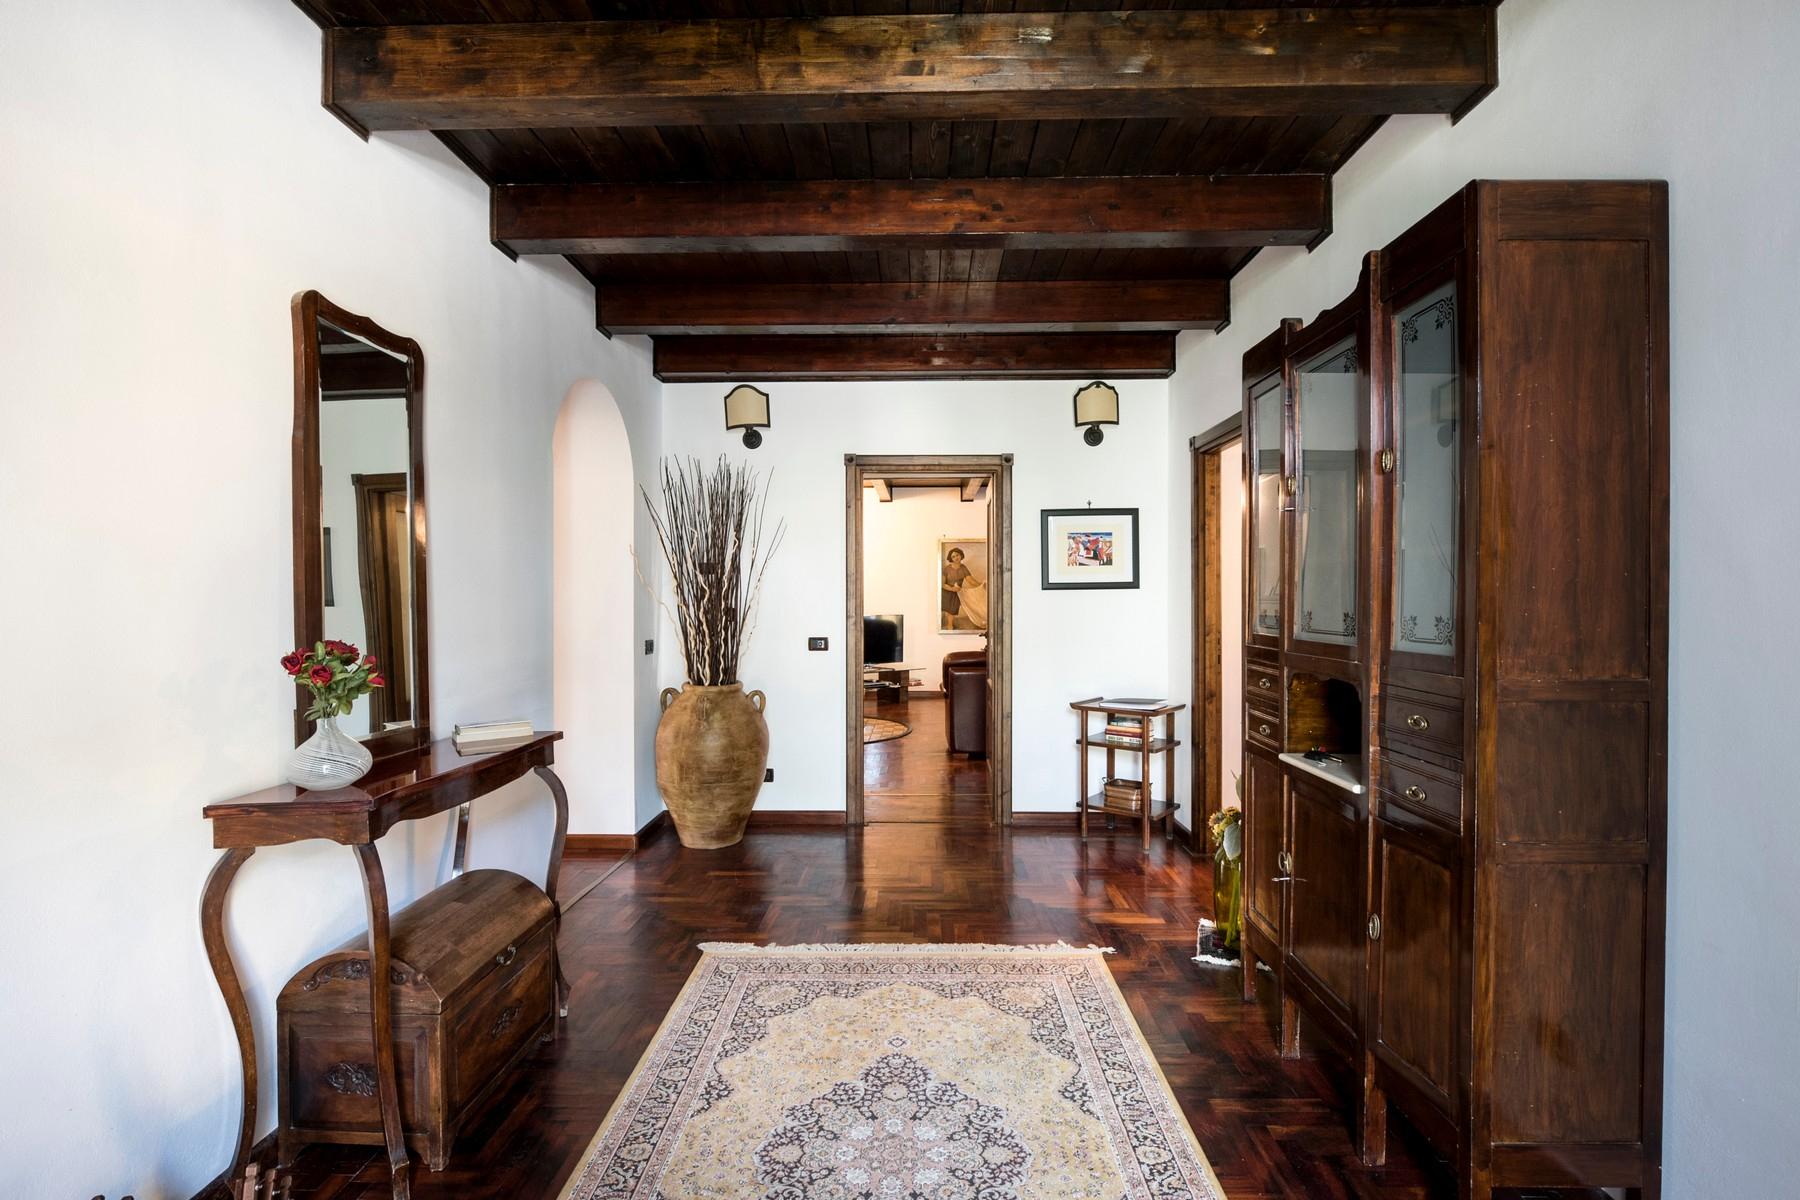 Casa indipendente in Vendita a Noto: 5 locali, 300 mq - Foto 17